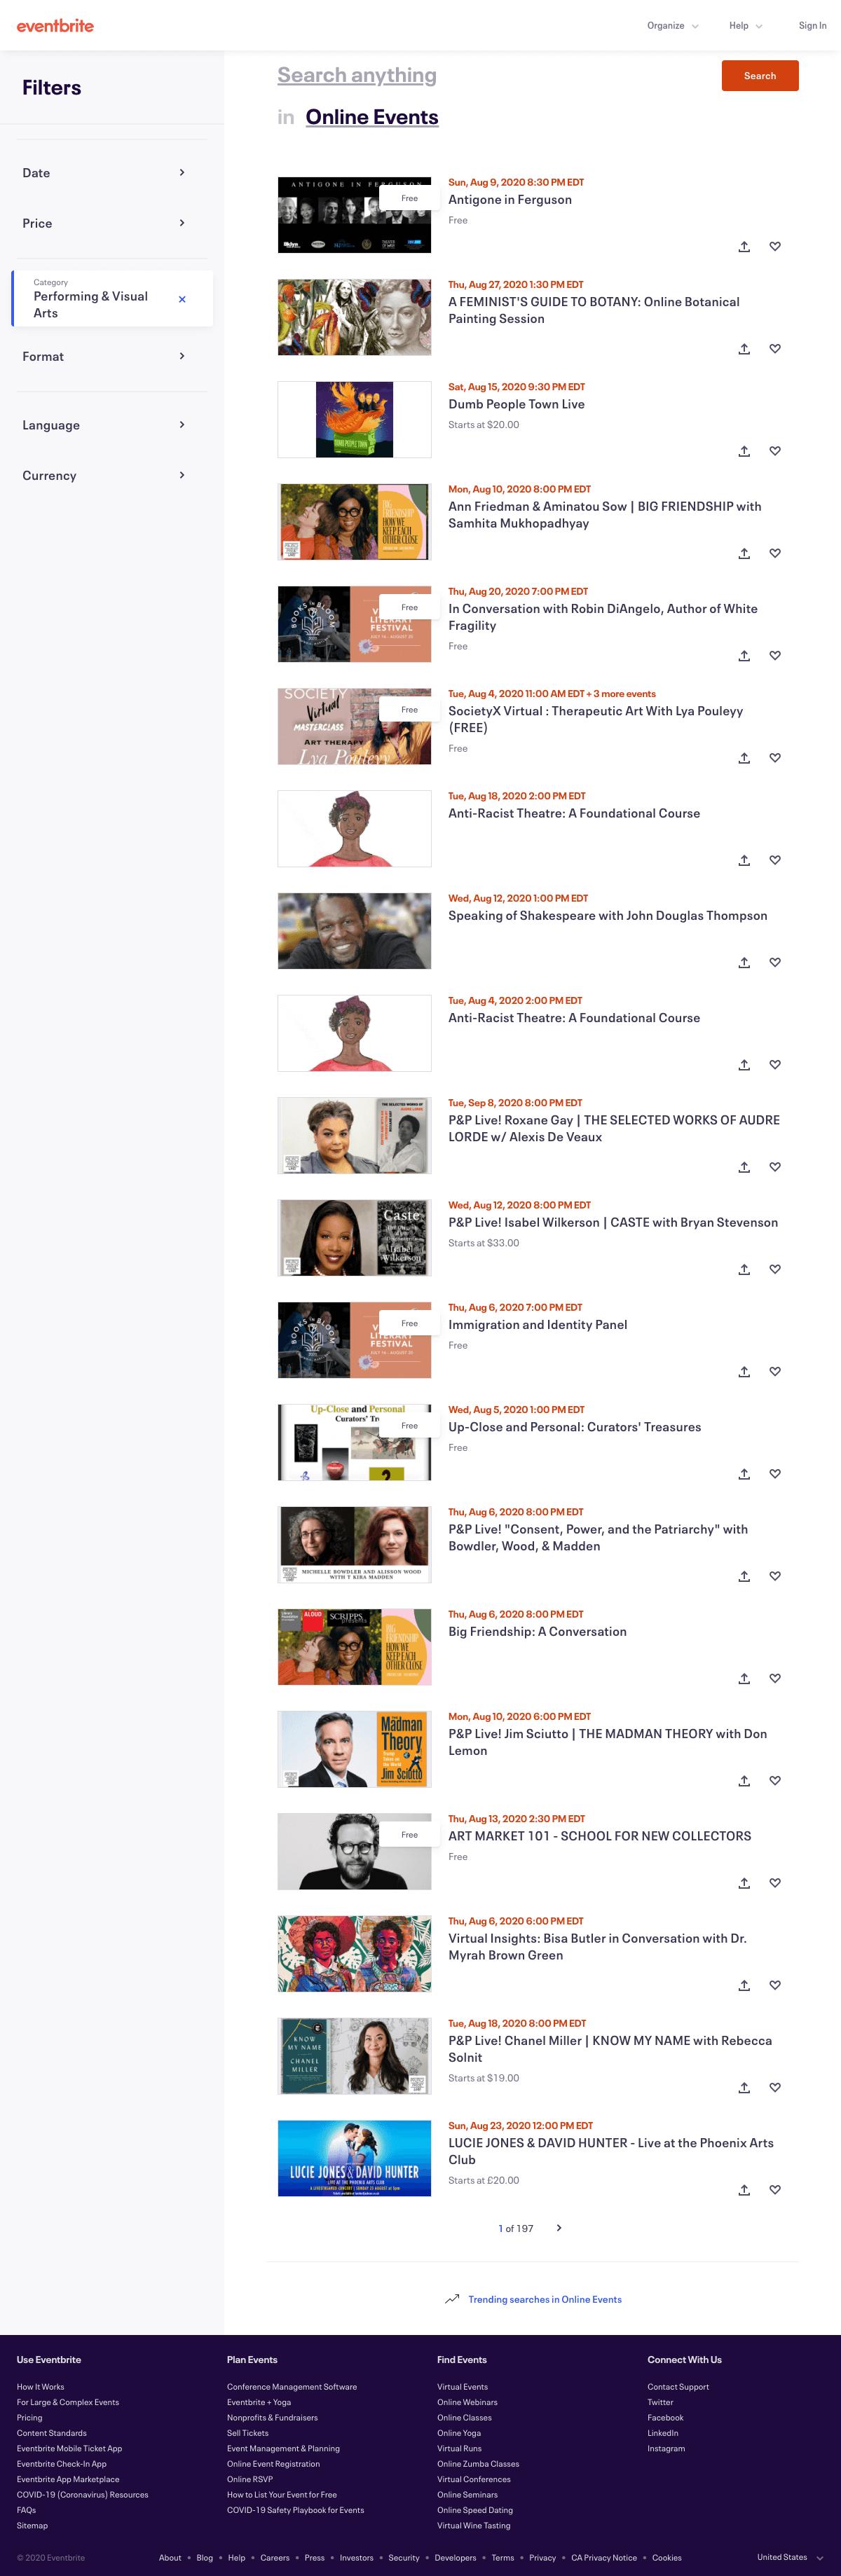 Eventbrite - Search results page